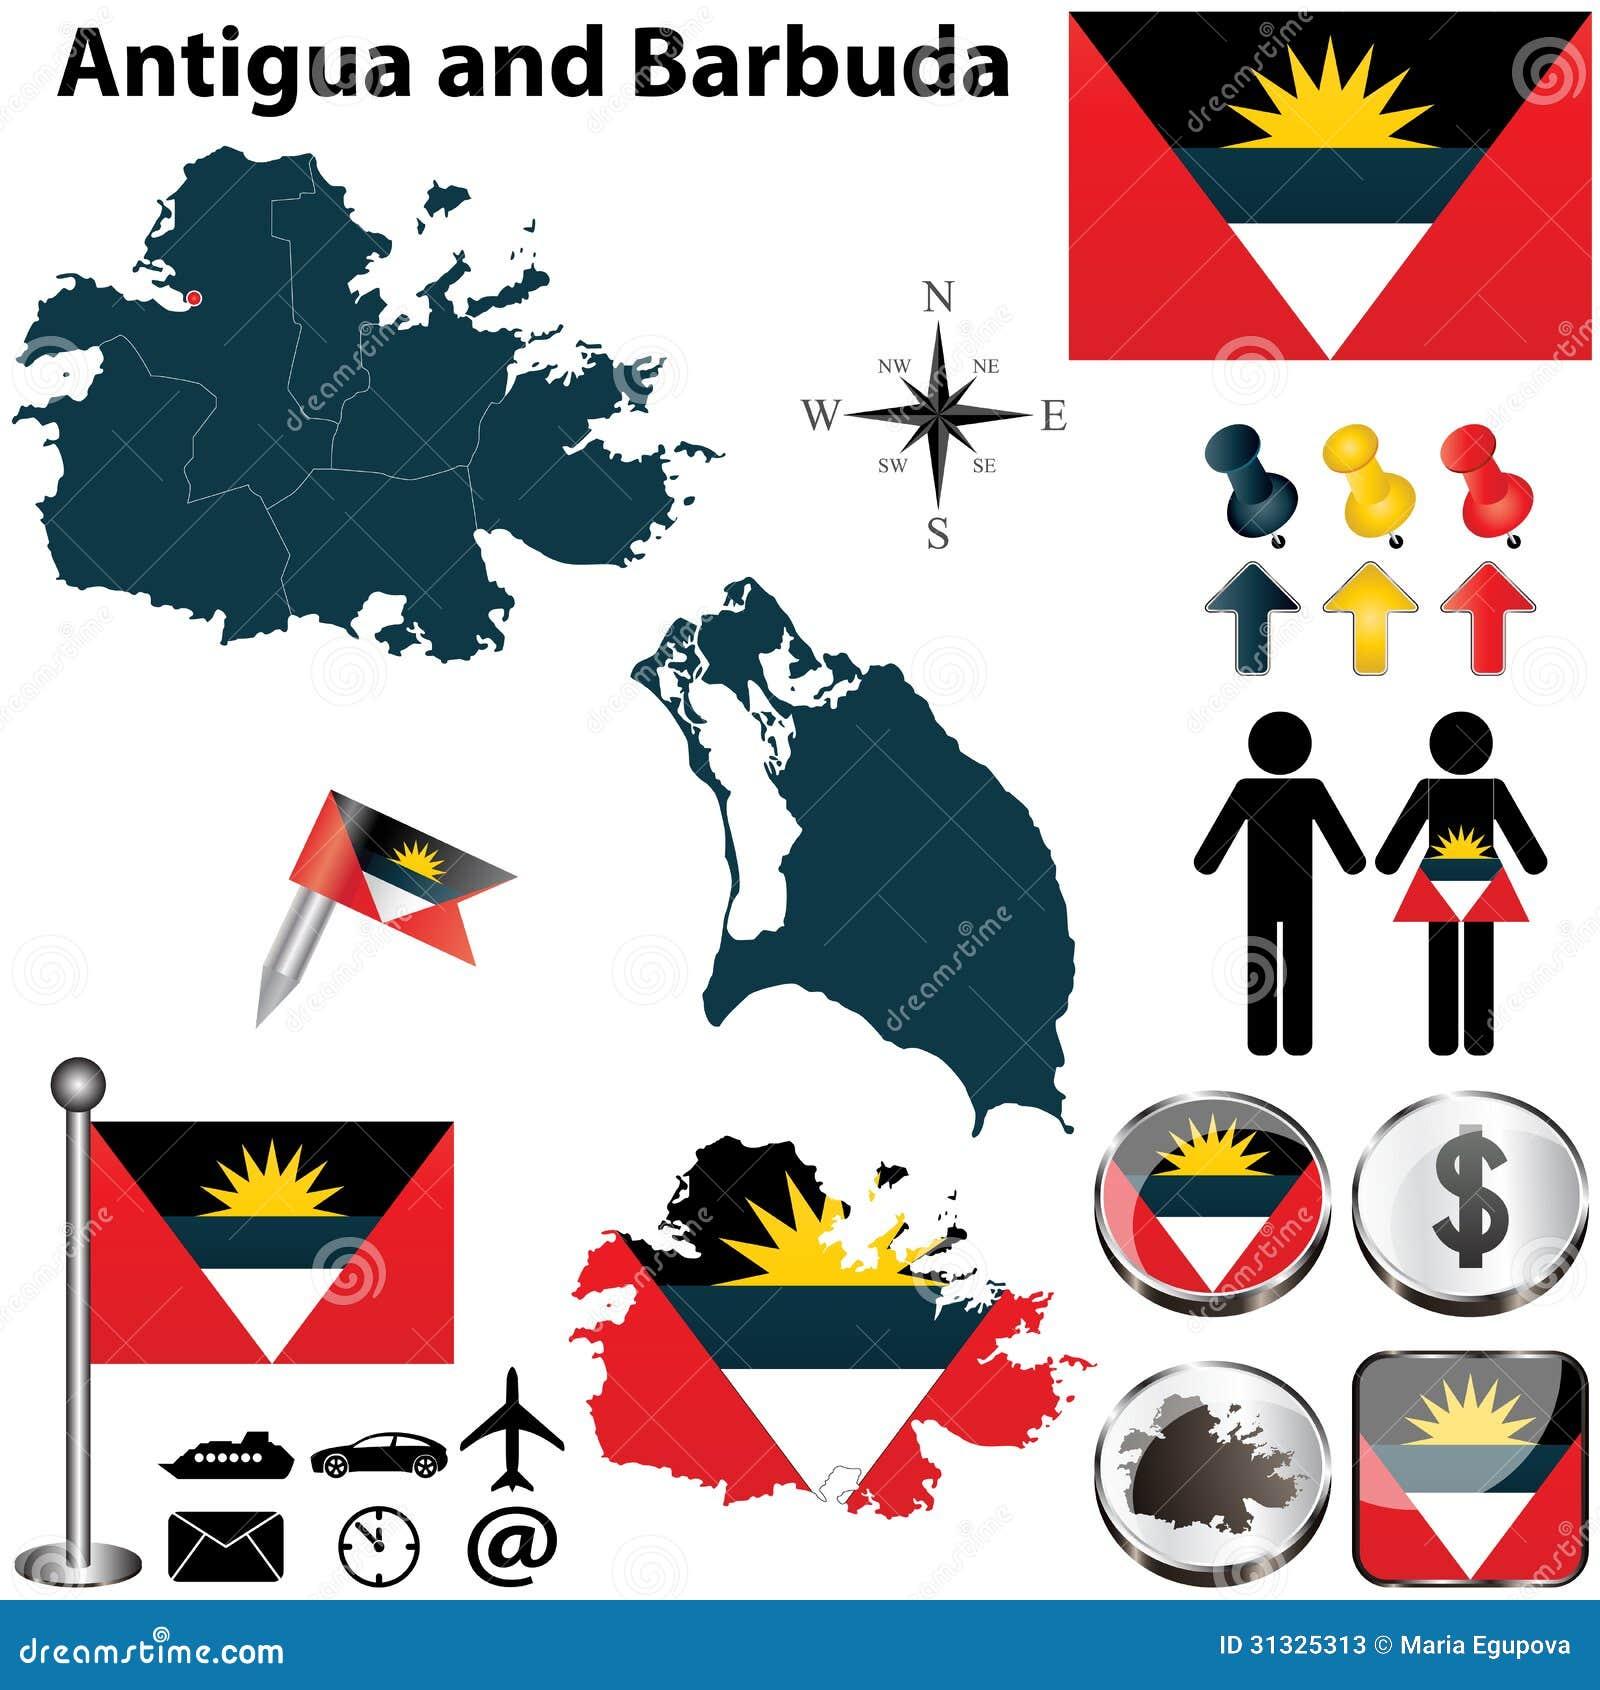 how to make the antigua and barbuda flag on trinket